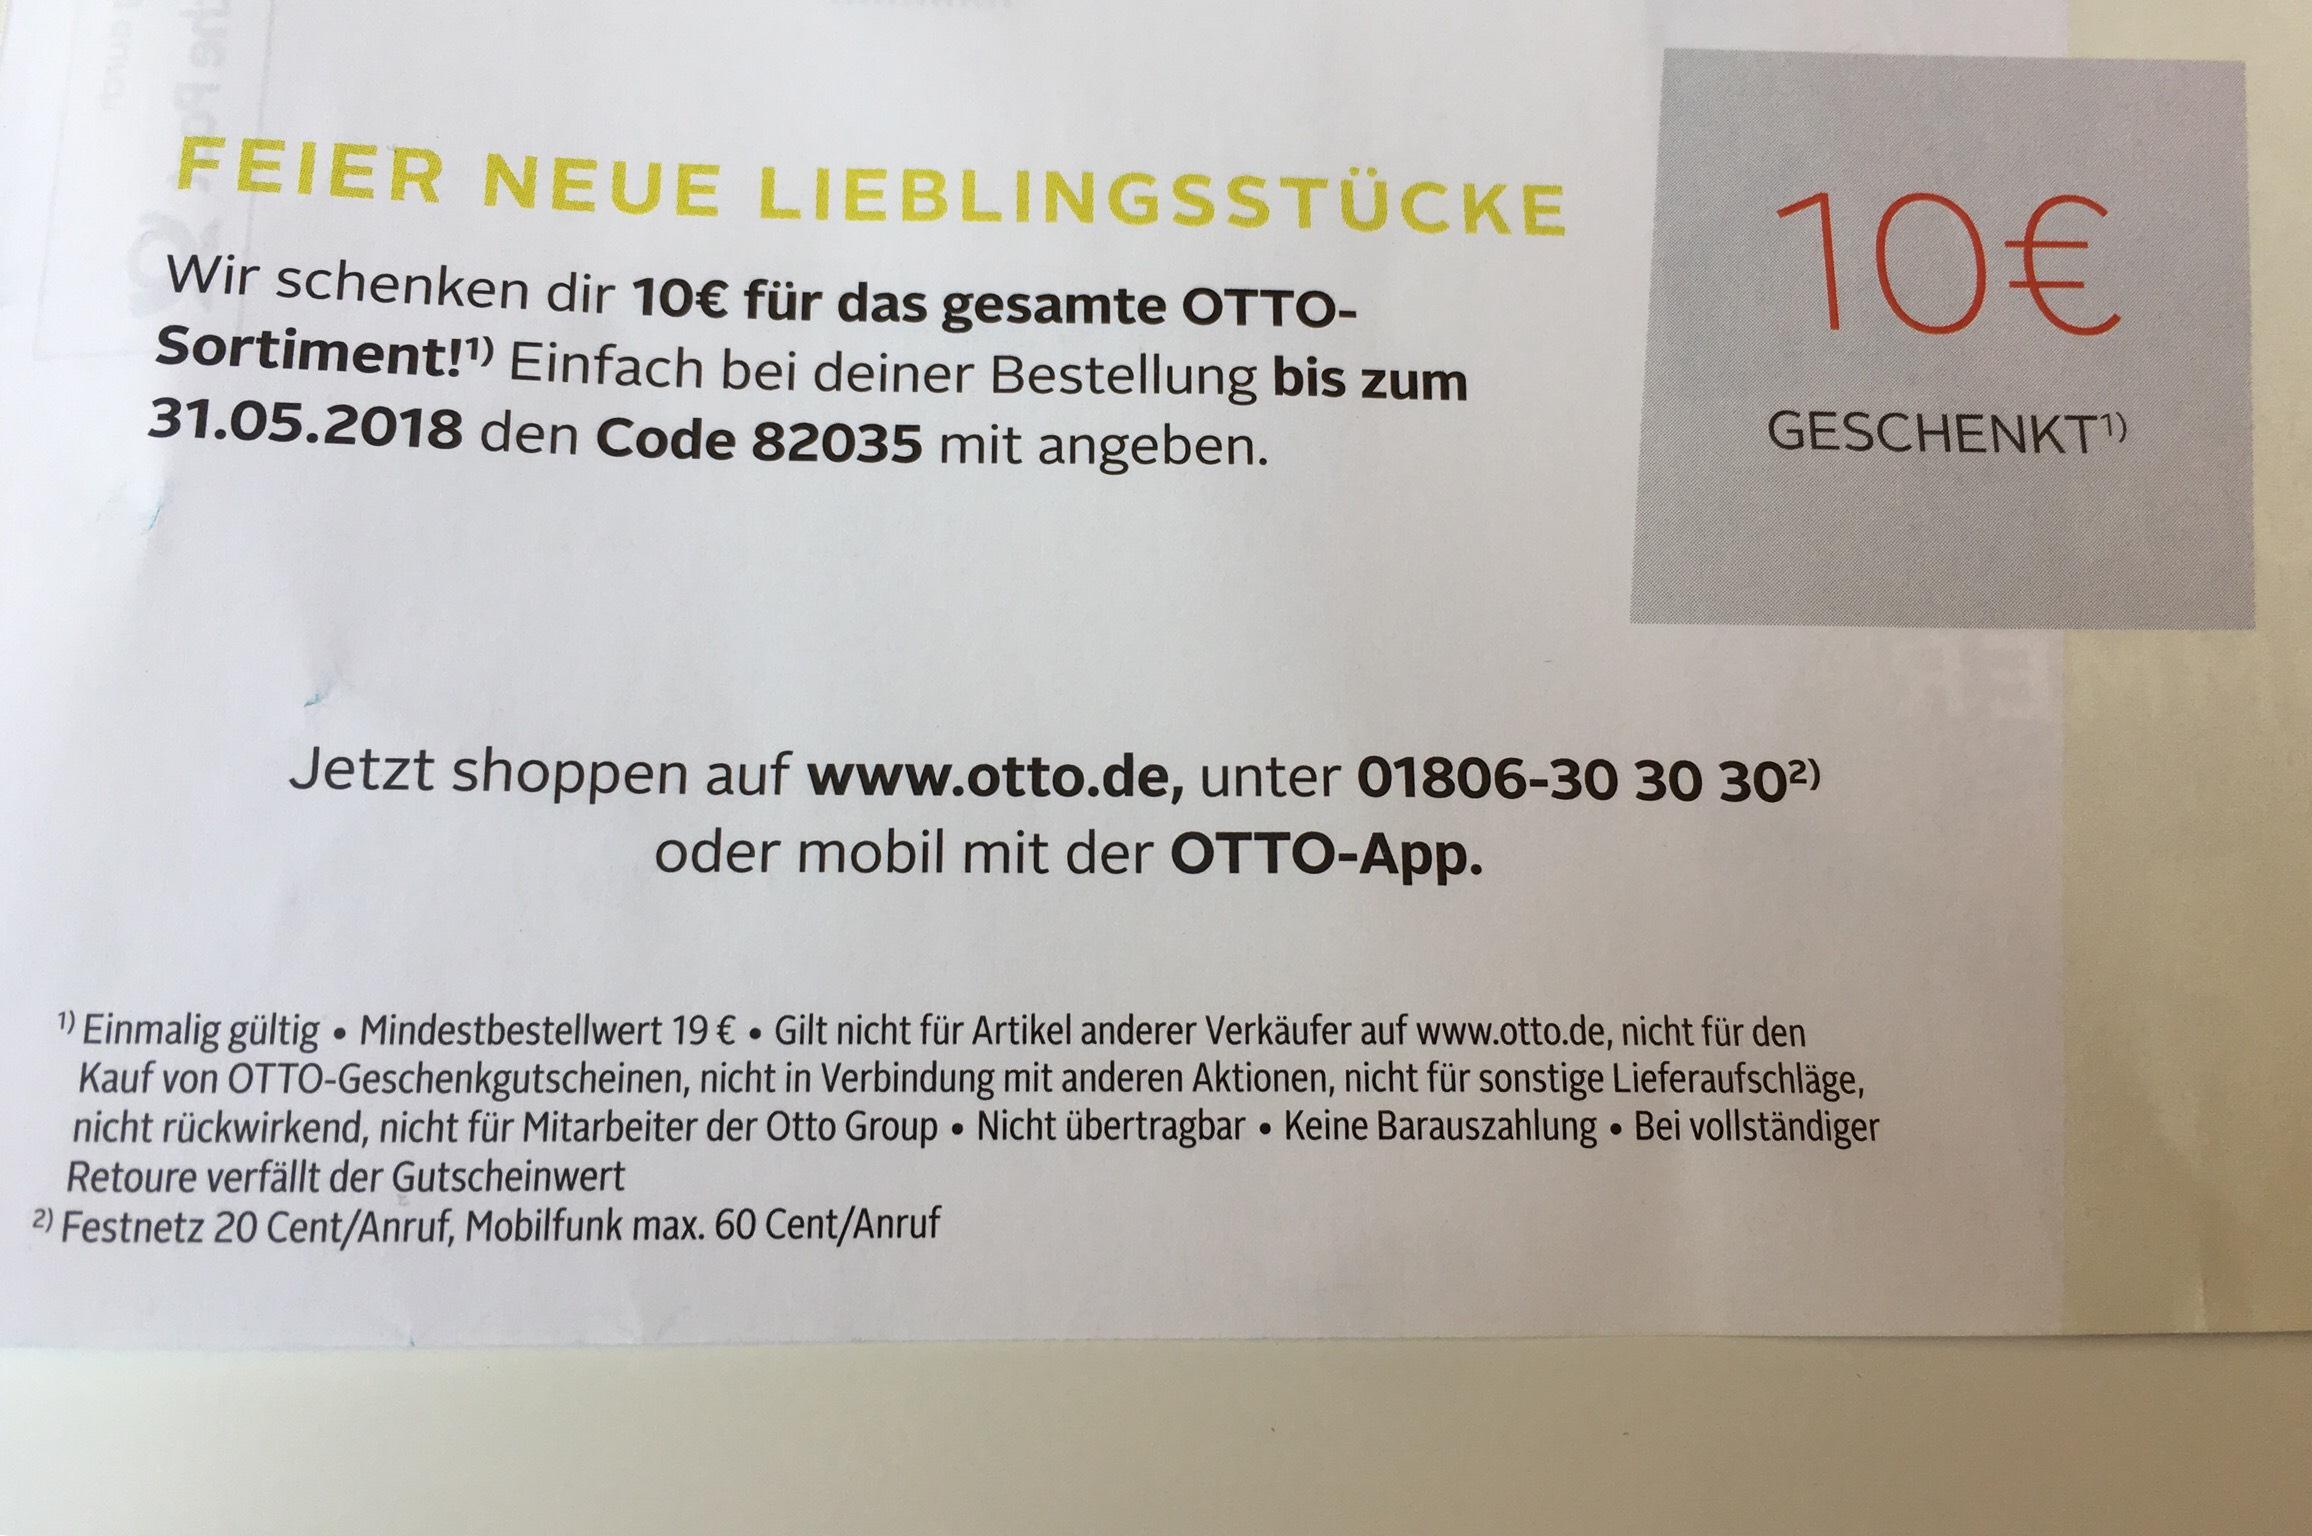 10 € Rabatt auf gesamtes Otto-Sortiment (19€ MBW)